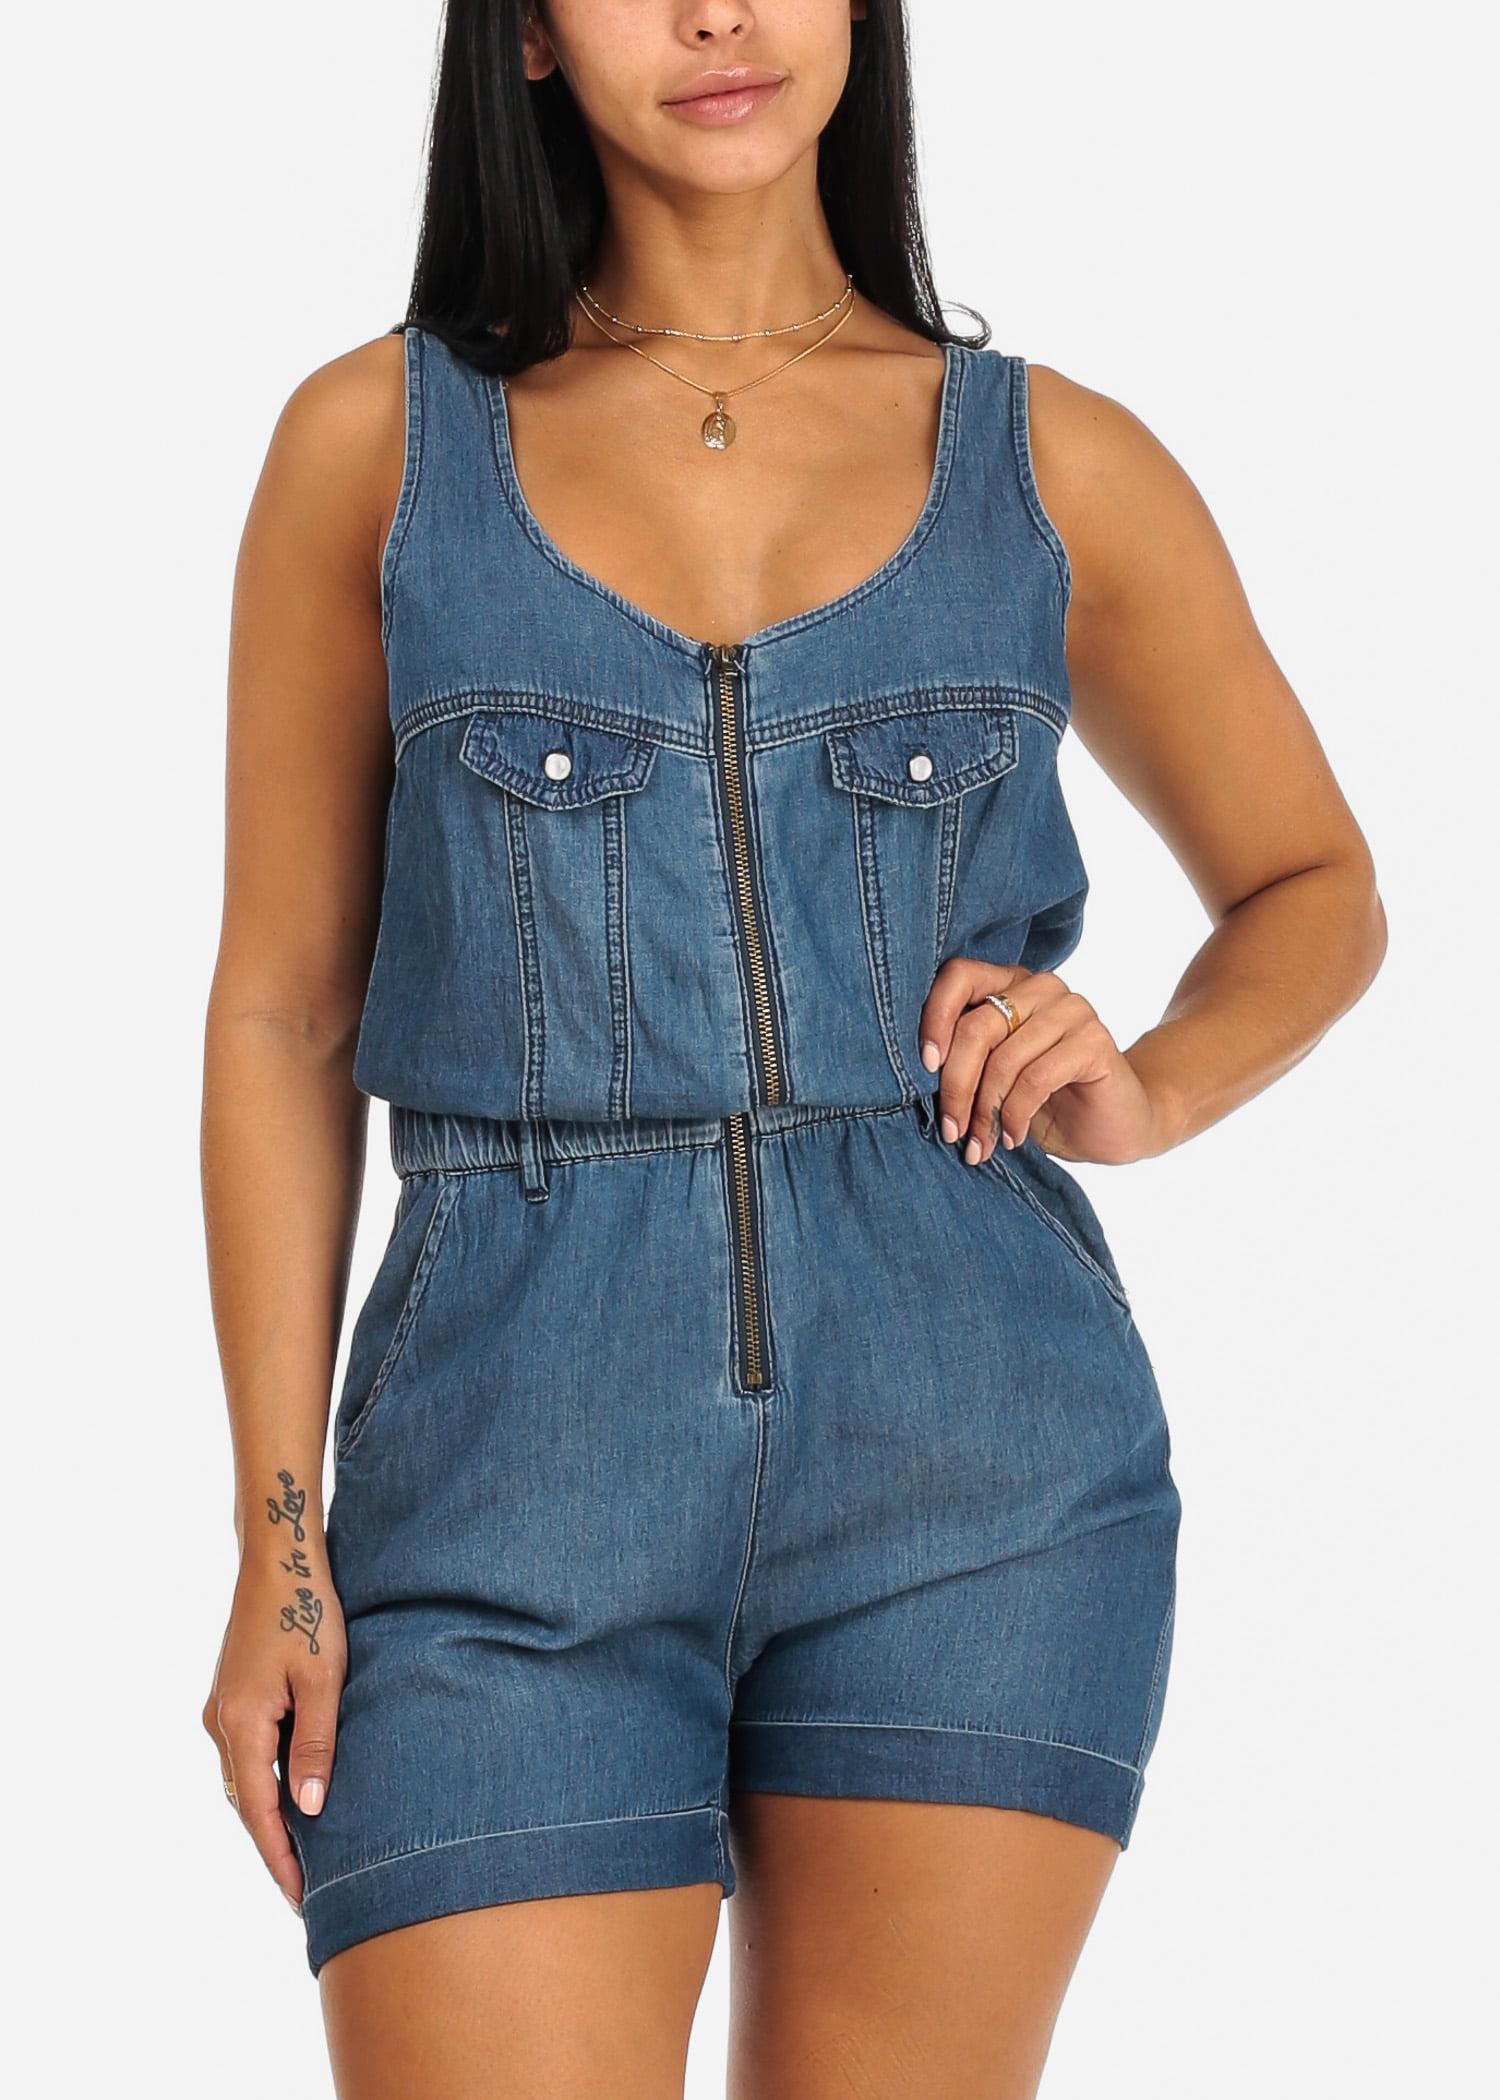 Womens Juniors Med Wash Sleeveless Front Zipper Elastic Waist Denim Romper 10014J